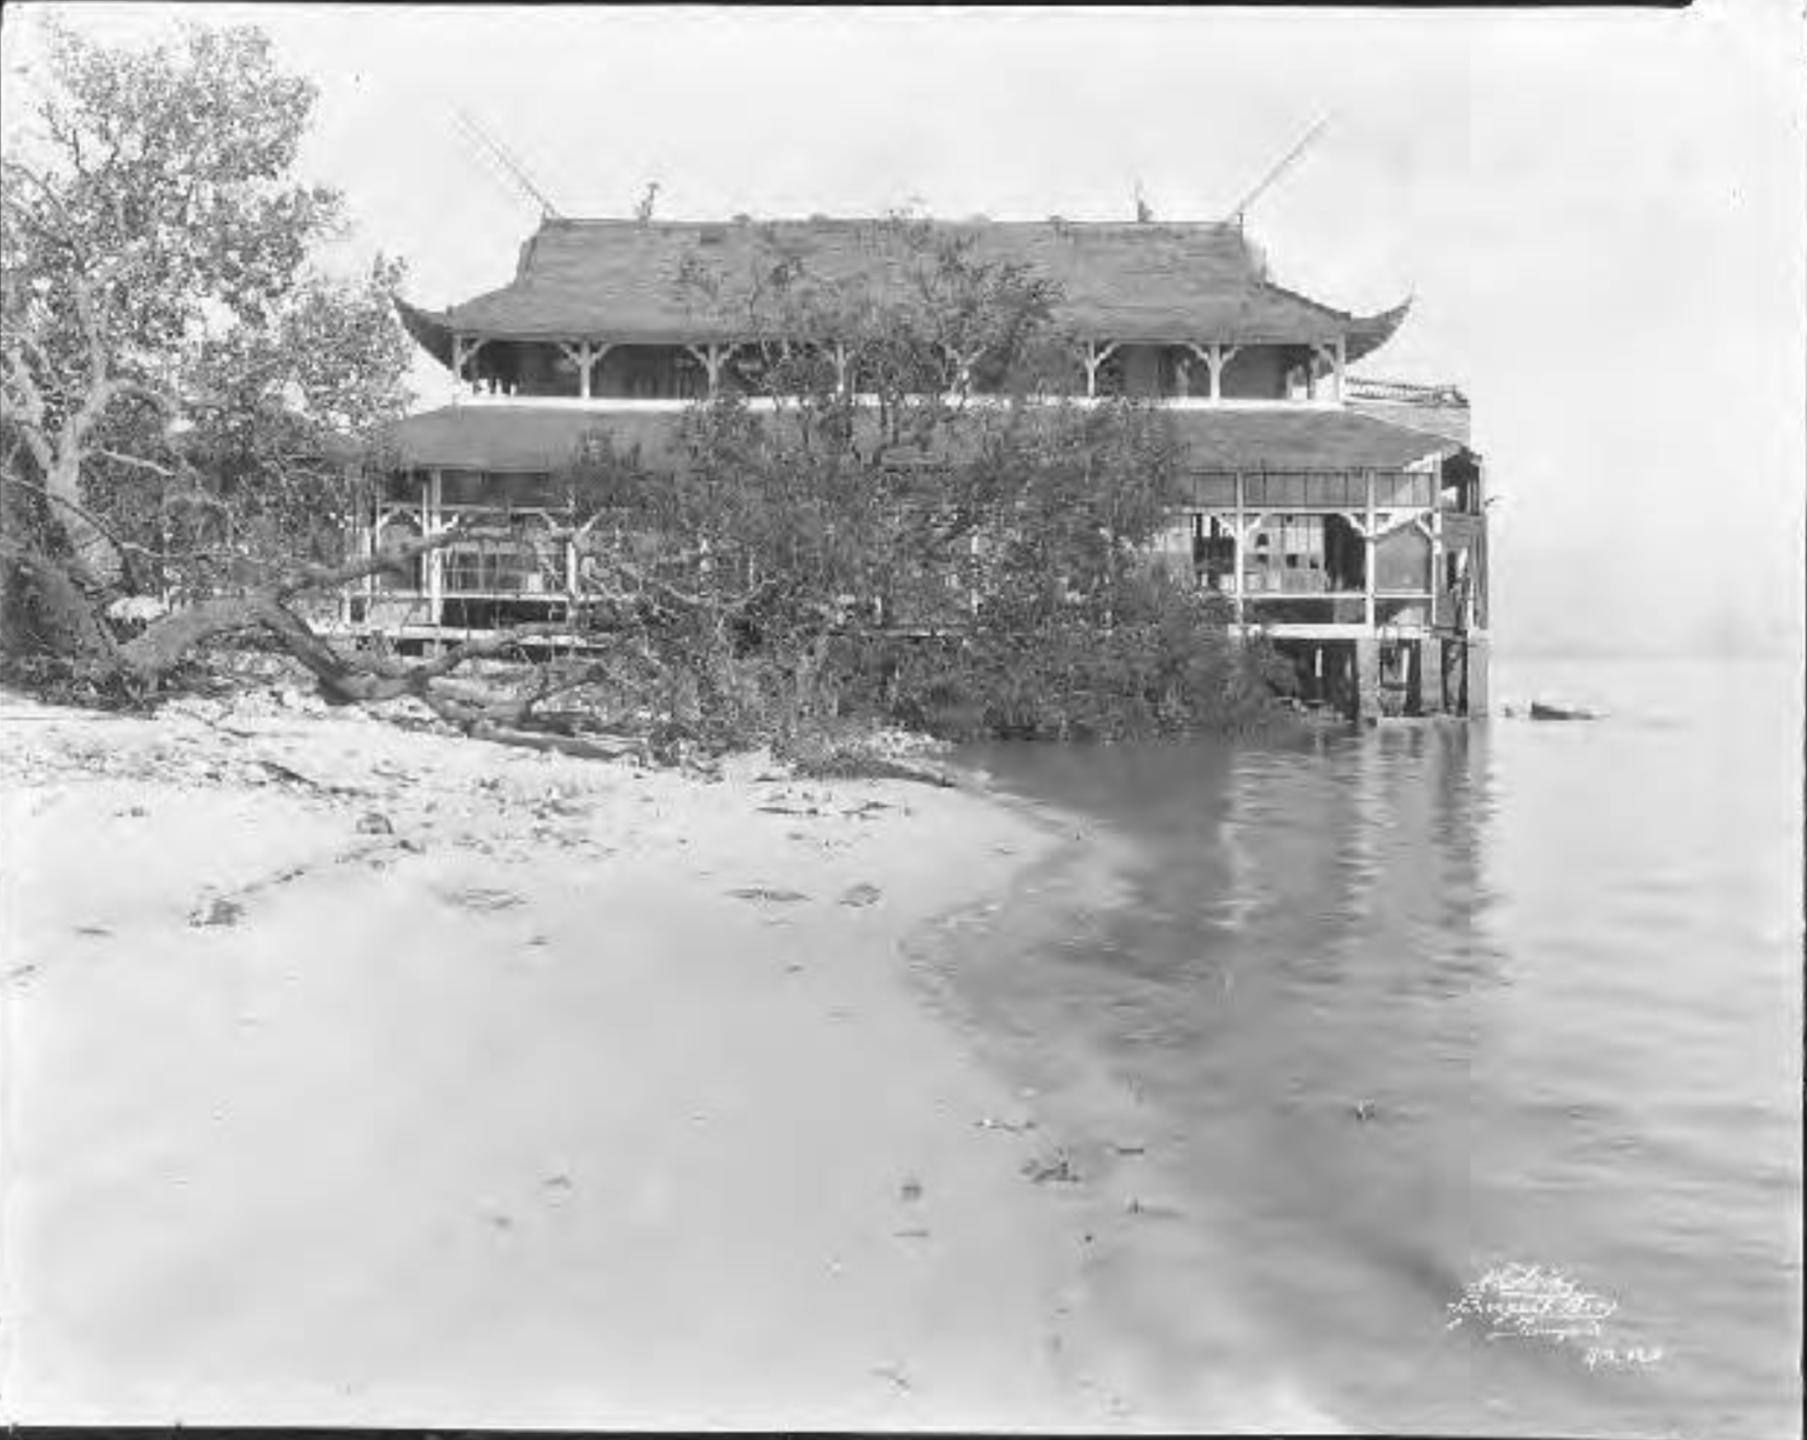 urricane damage to Ballast Point Pavilion Tampa, Fla..png